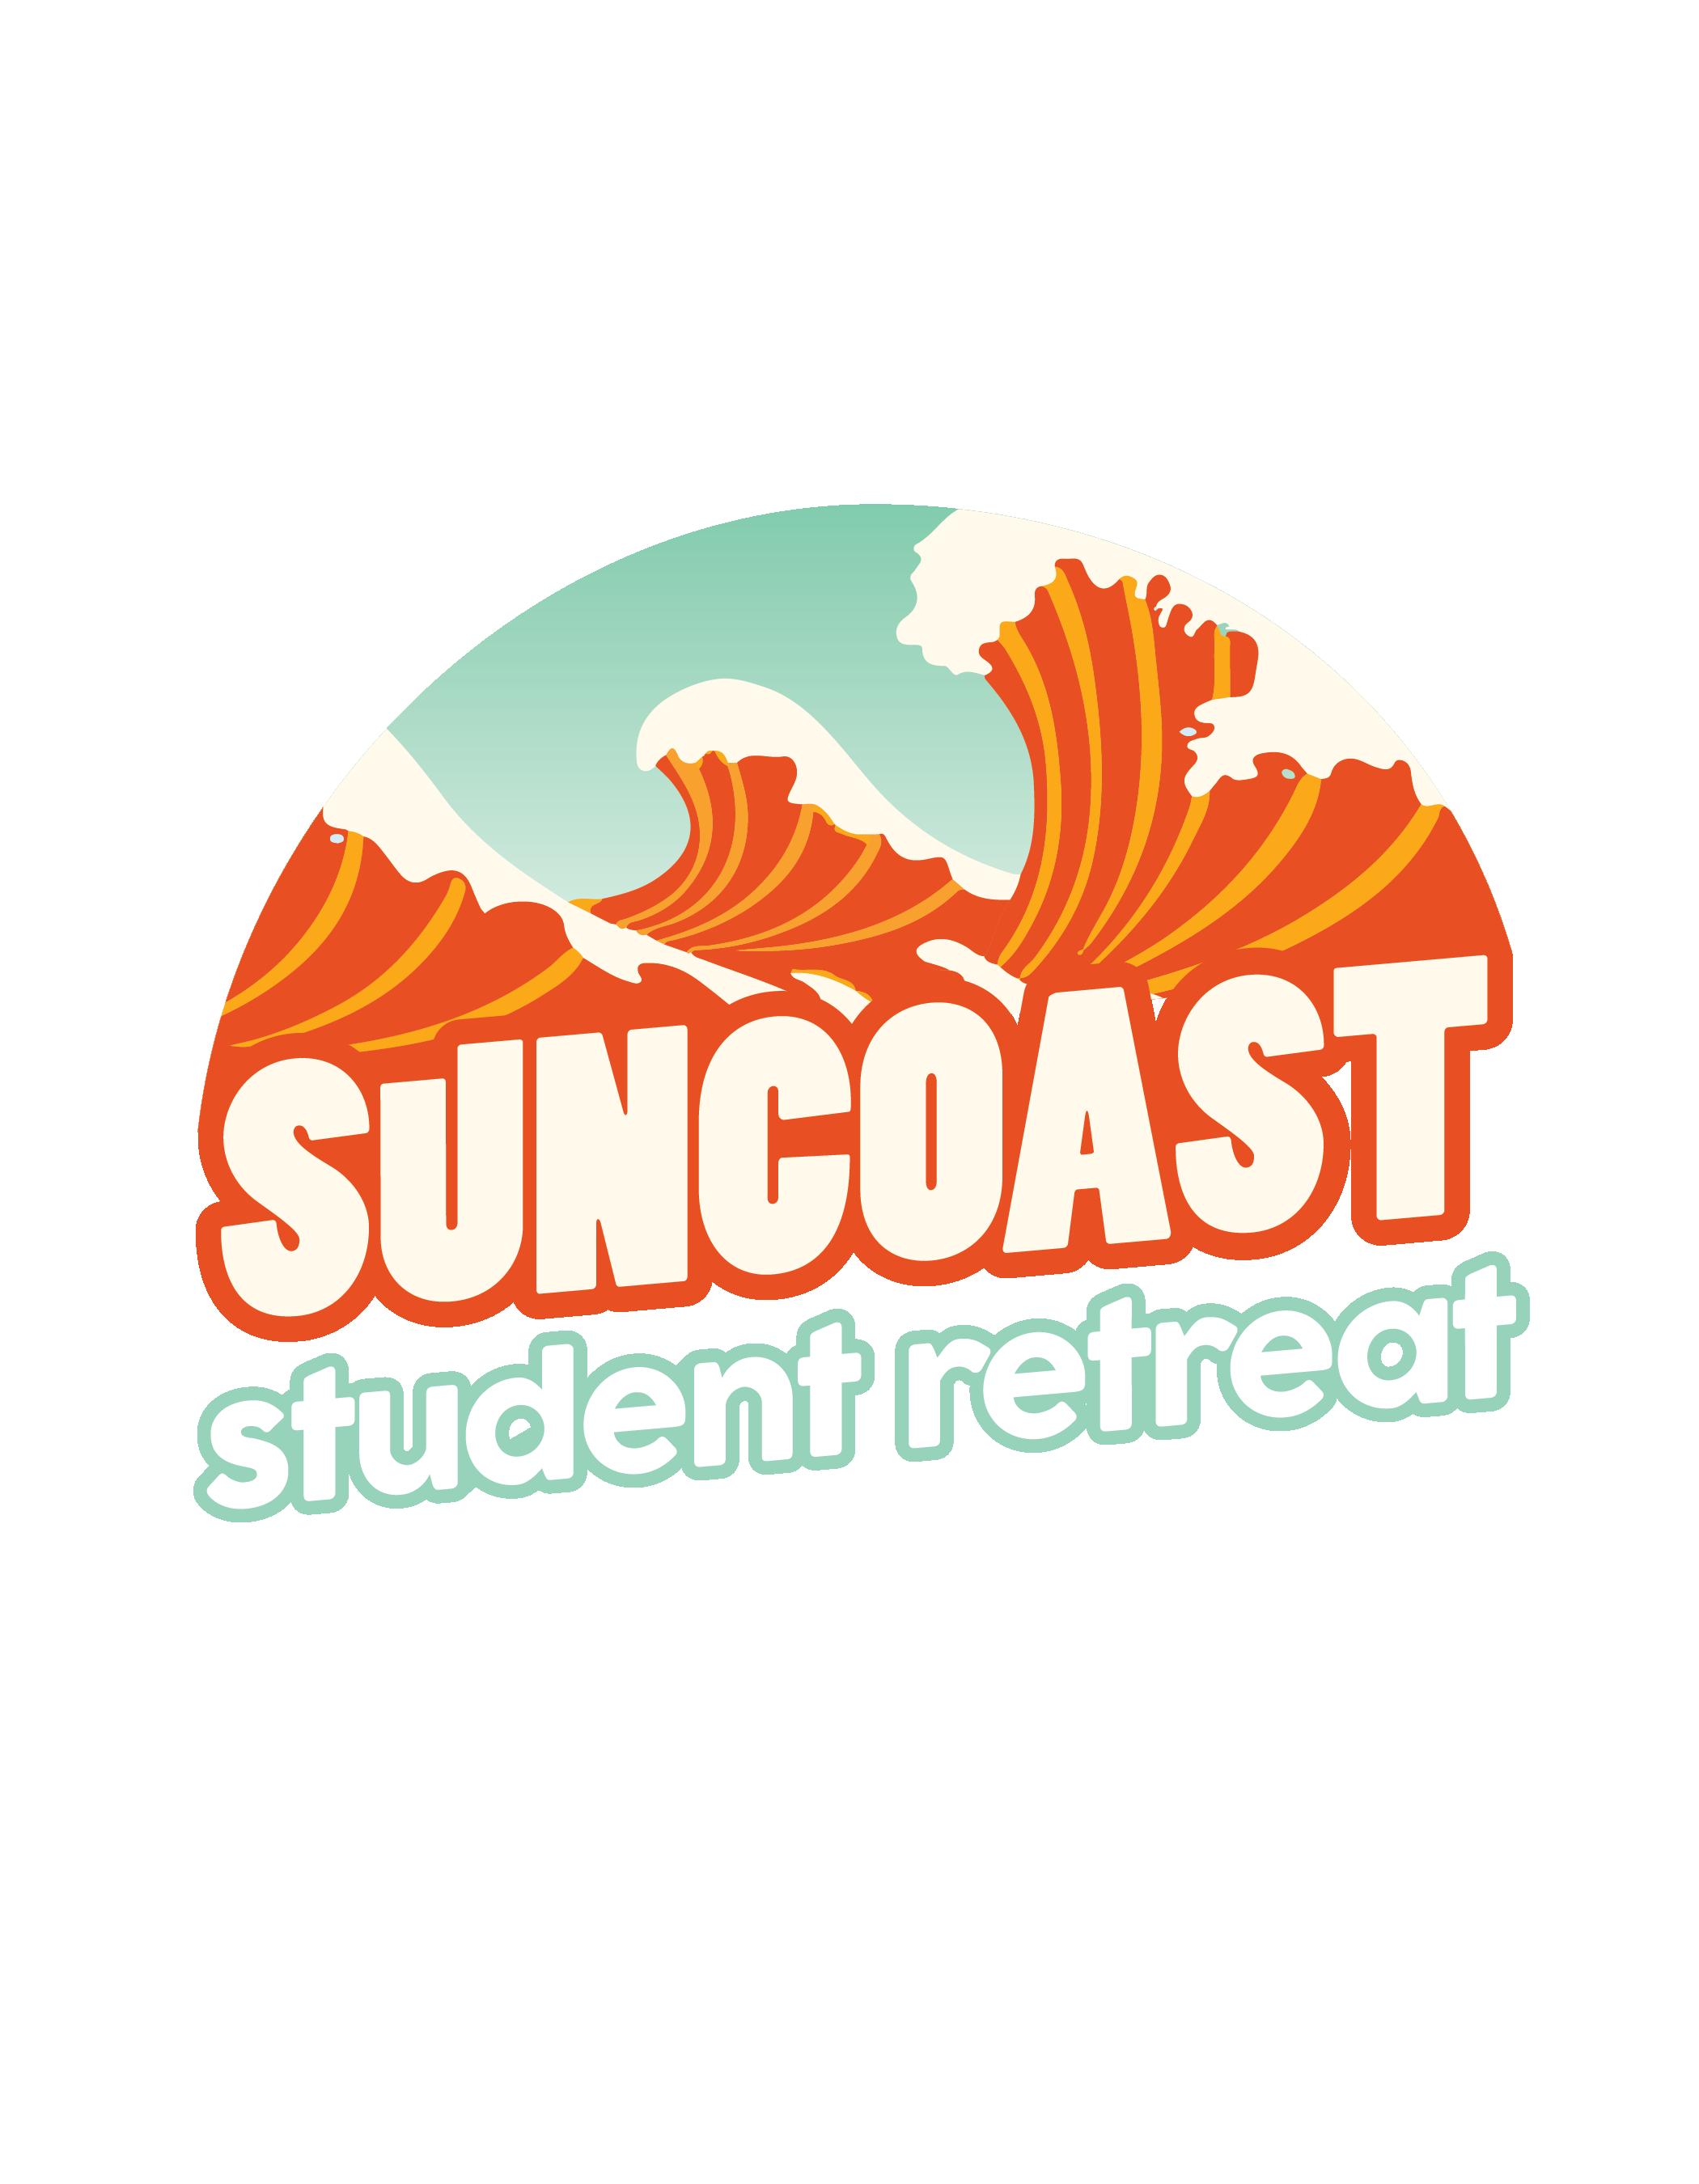 Suncoast retreat